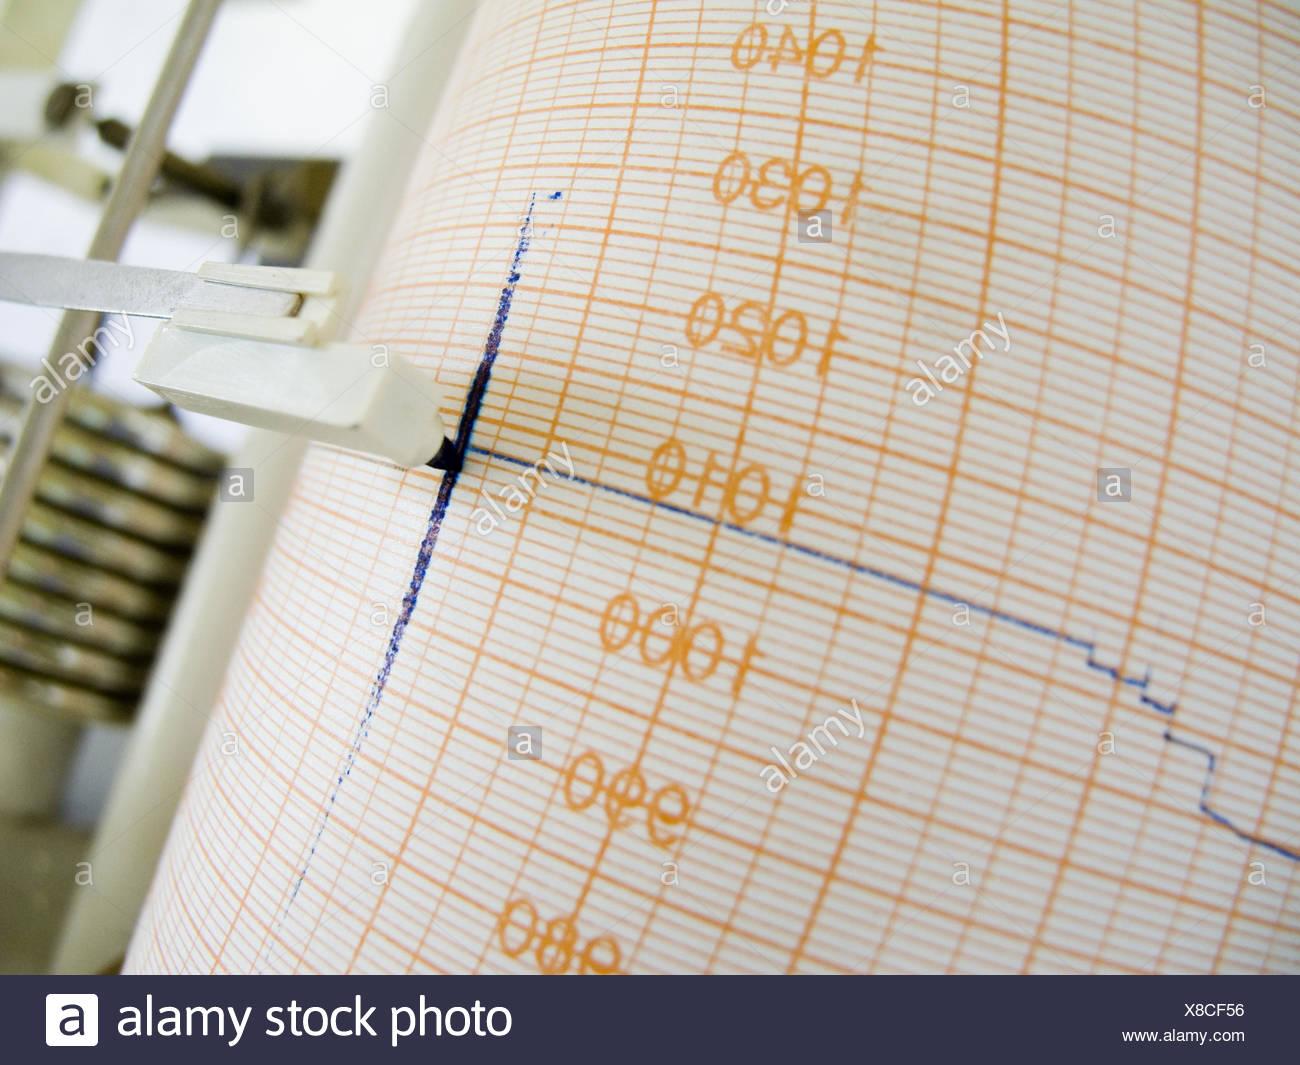 atmoshperic pressure - Stock Image